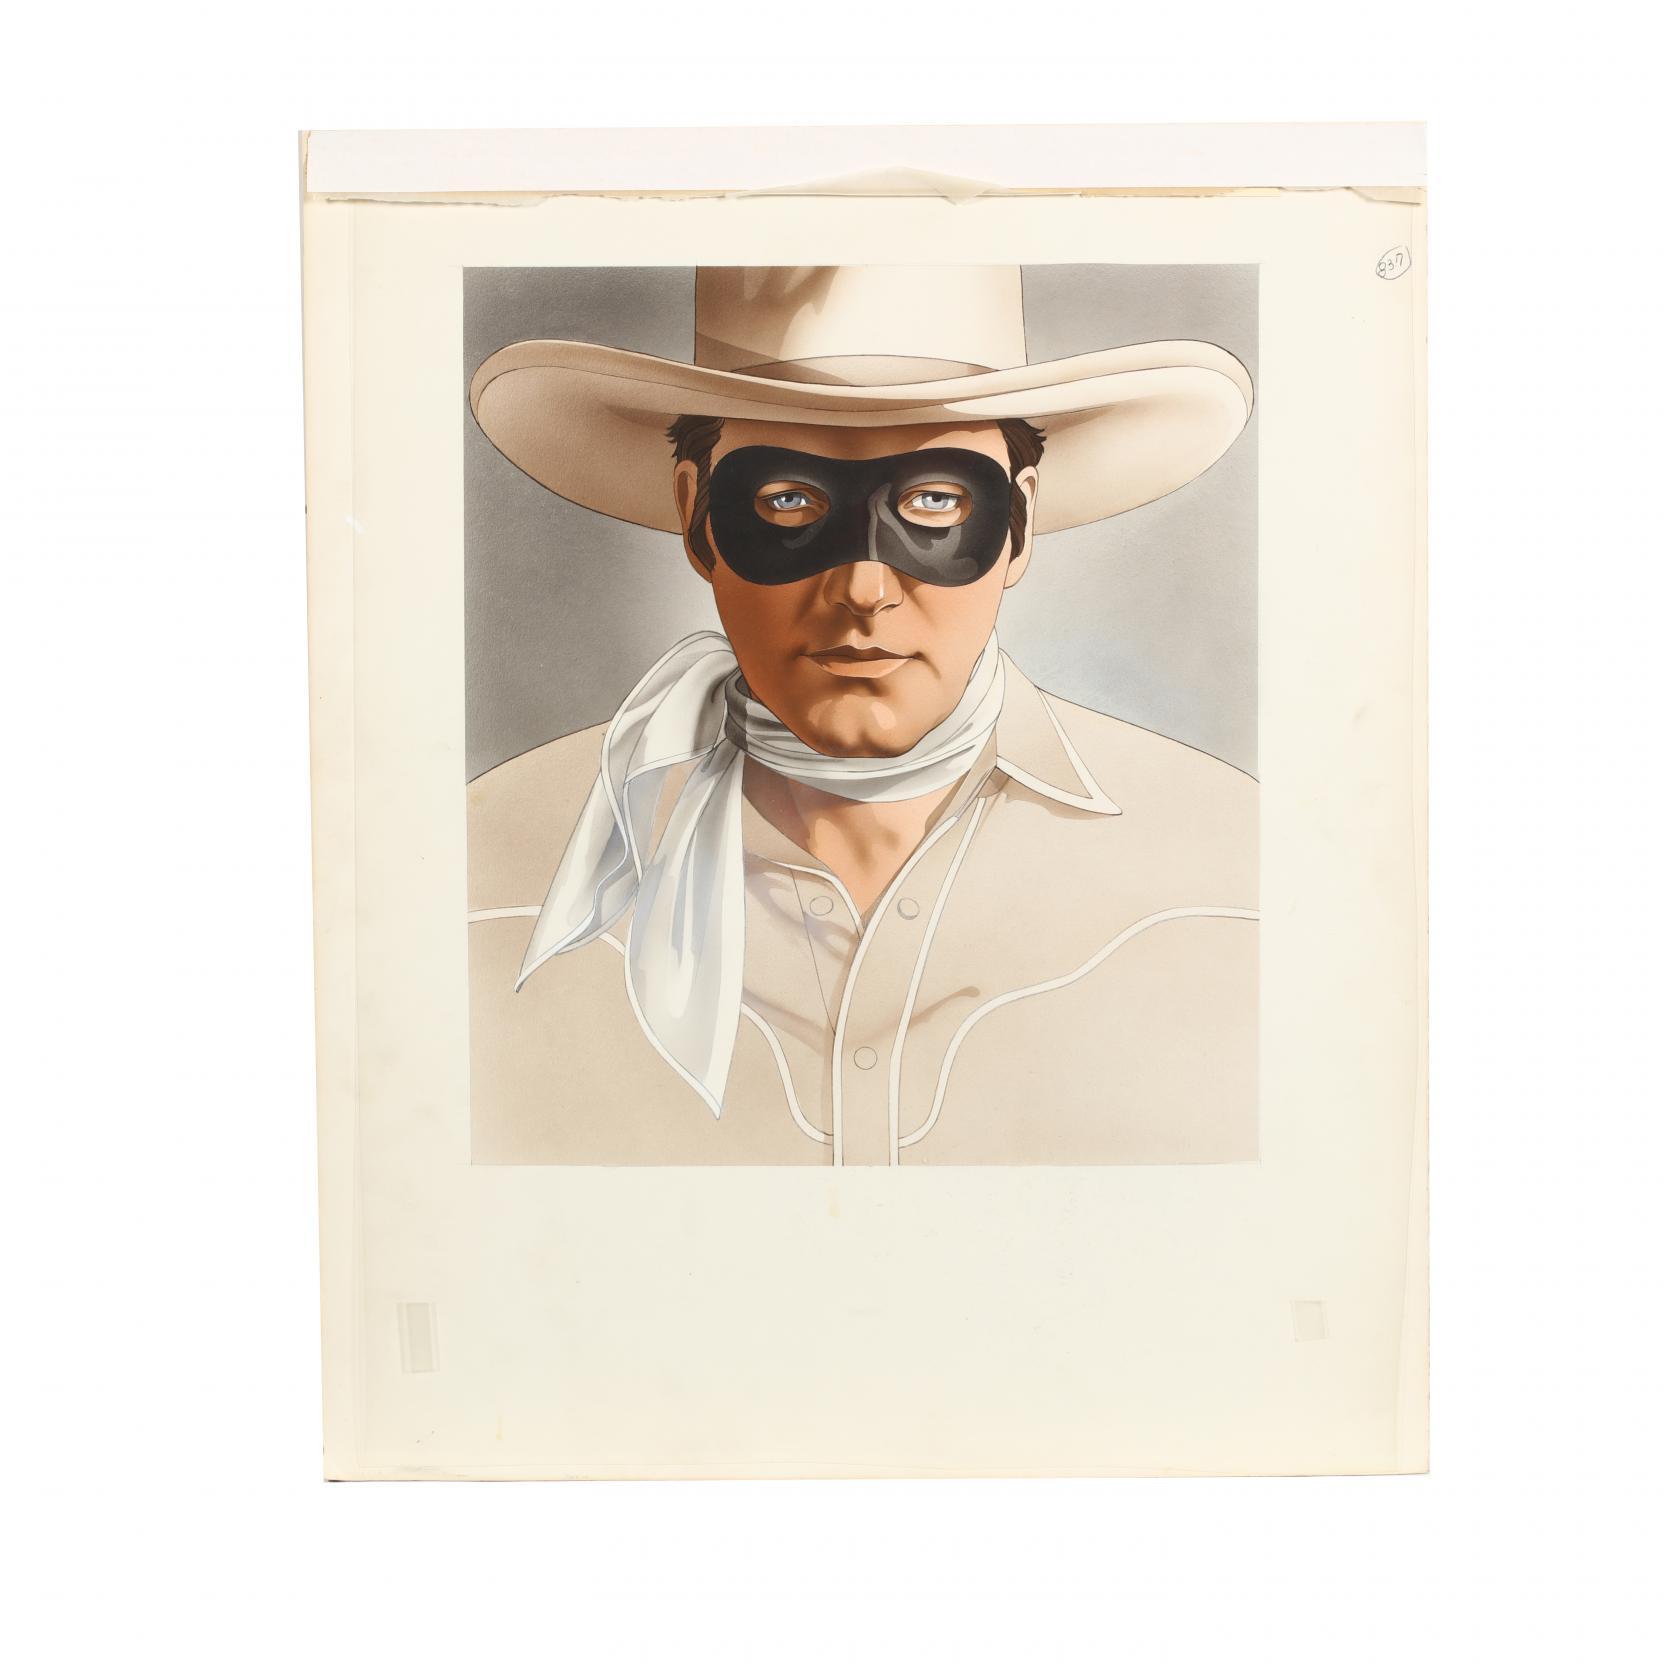 original-illustration-of-the-lone-ranger